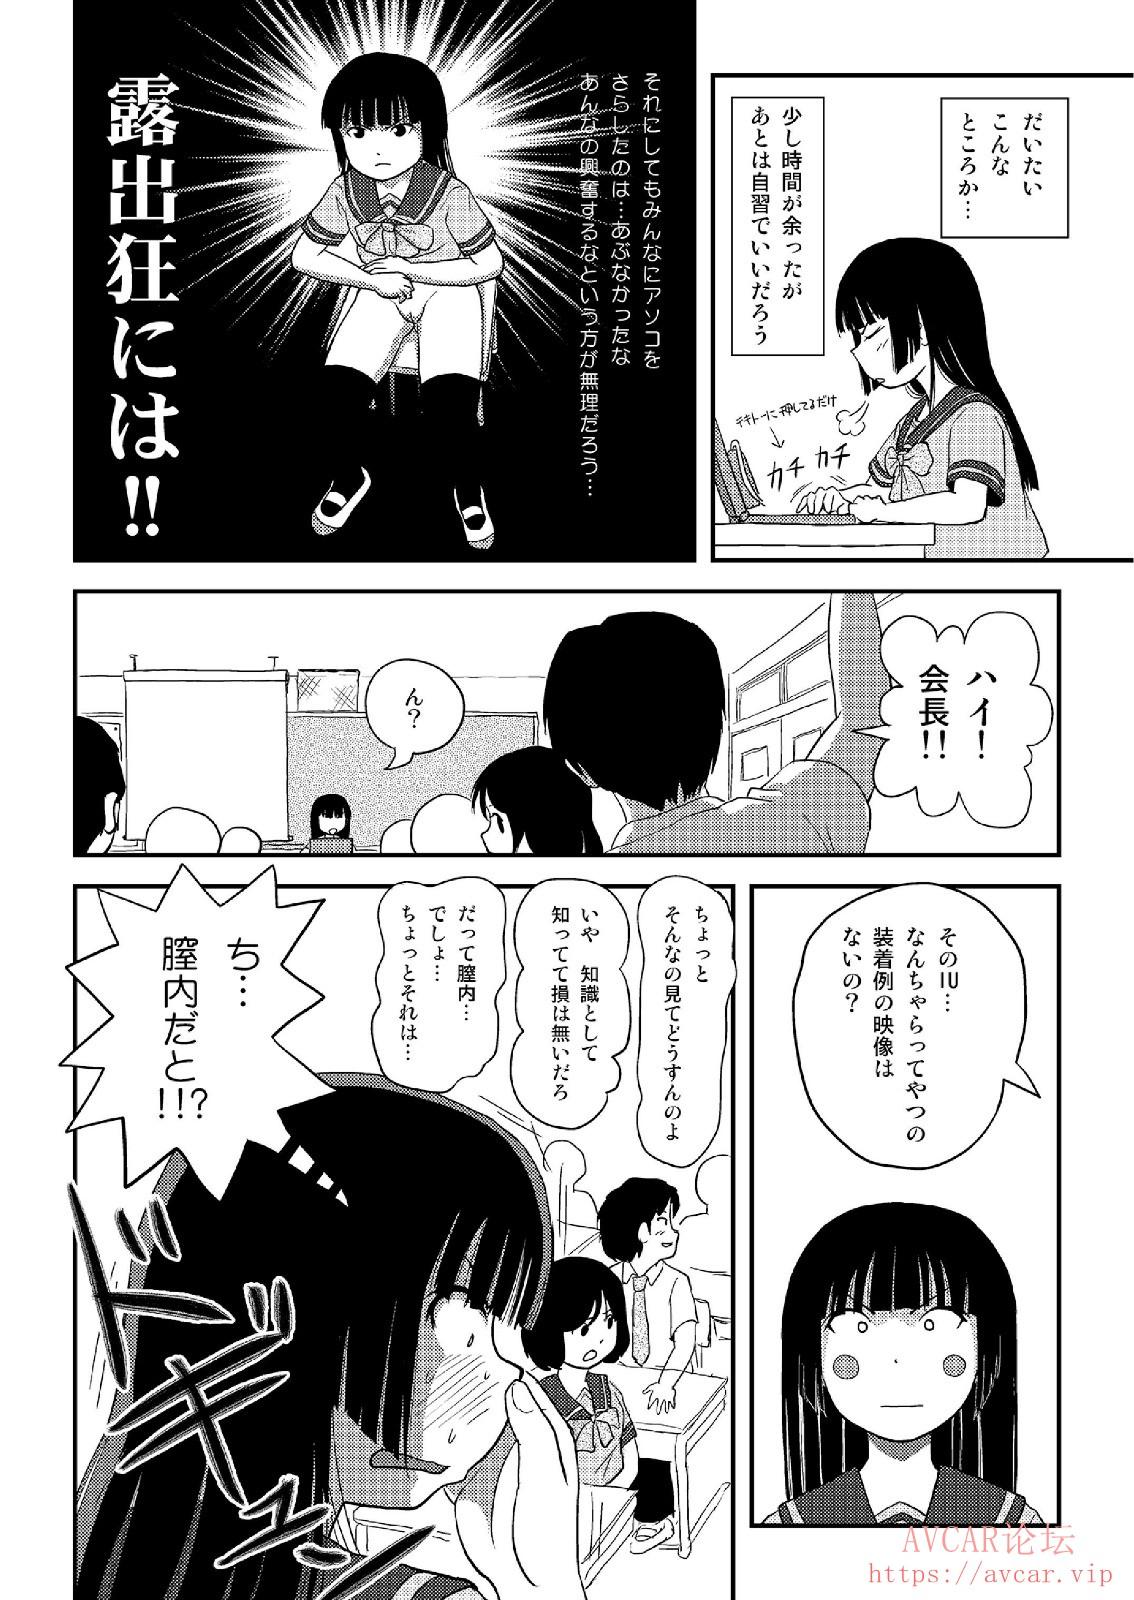 5_page_018.jpg